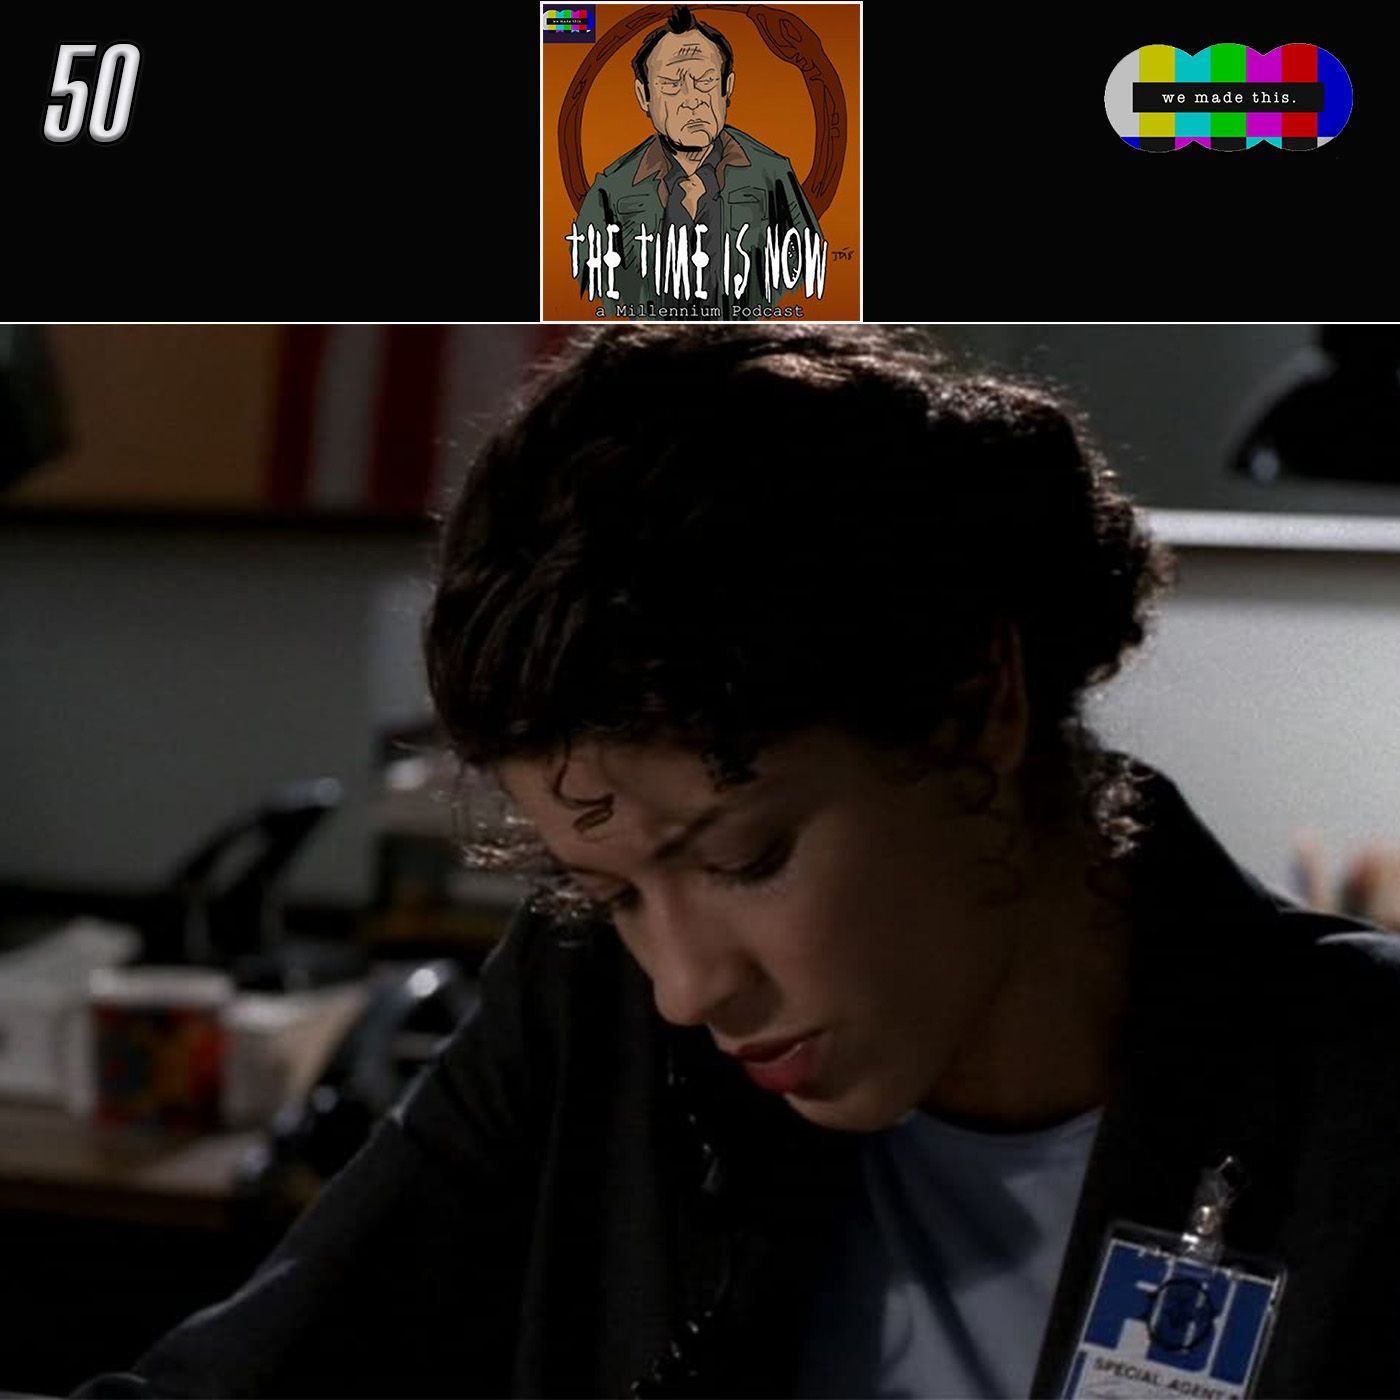 50. Exegesis